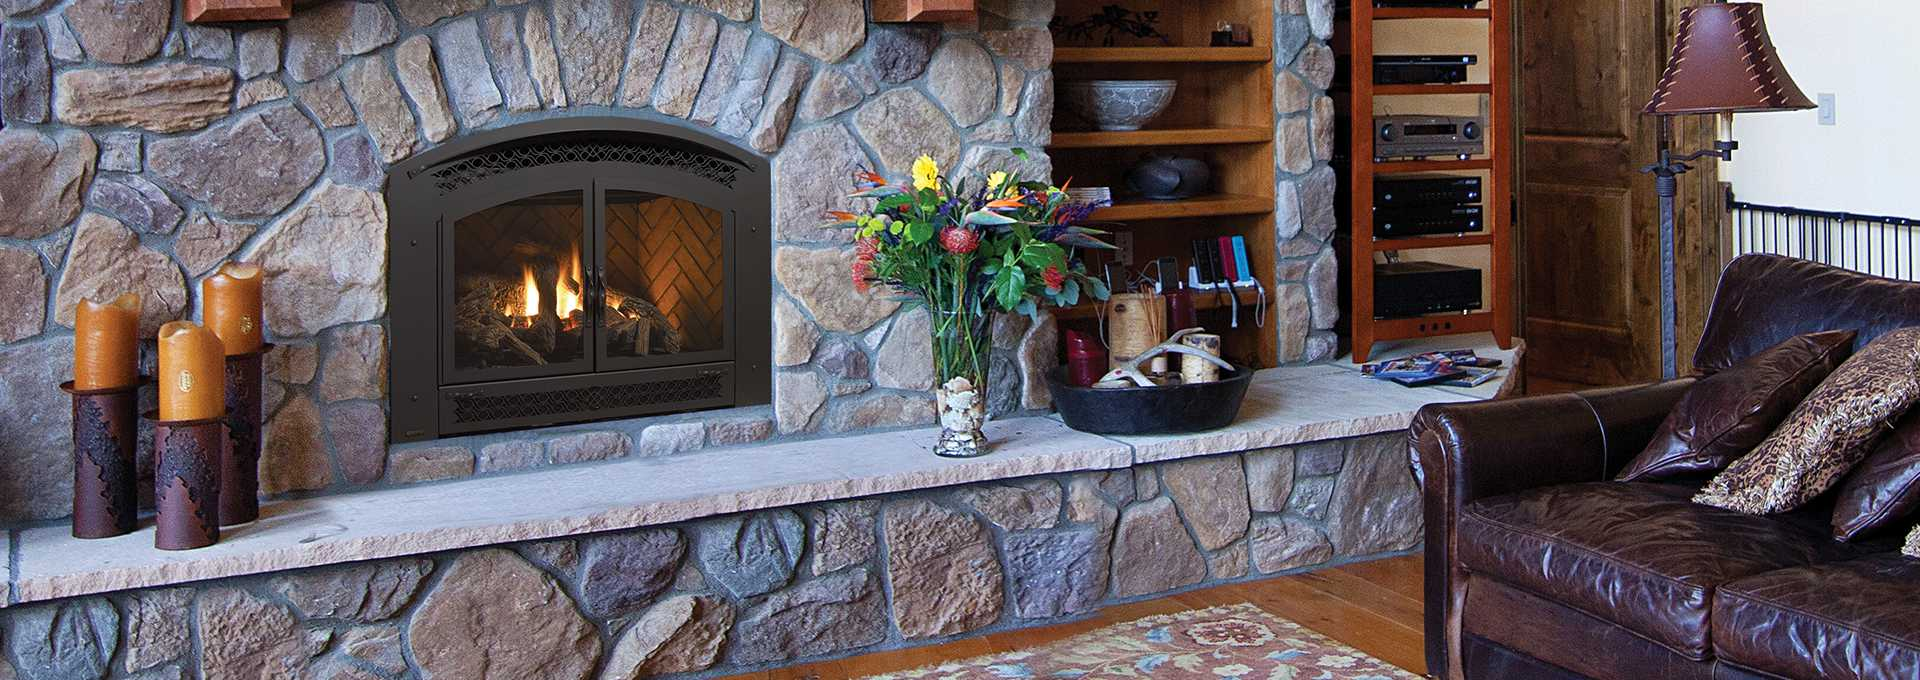 excalibur p90 gas fireplace gas fireplaces regency fireplace